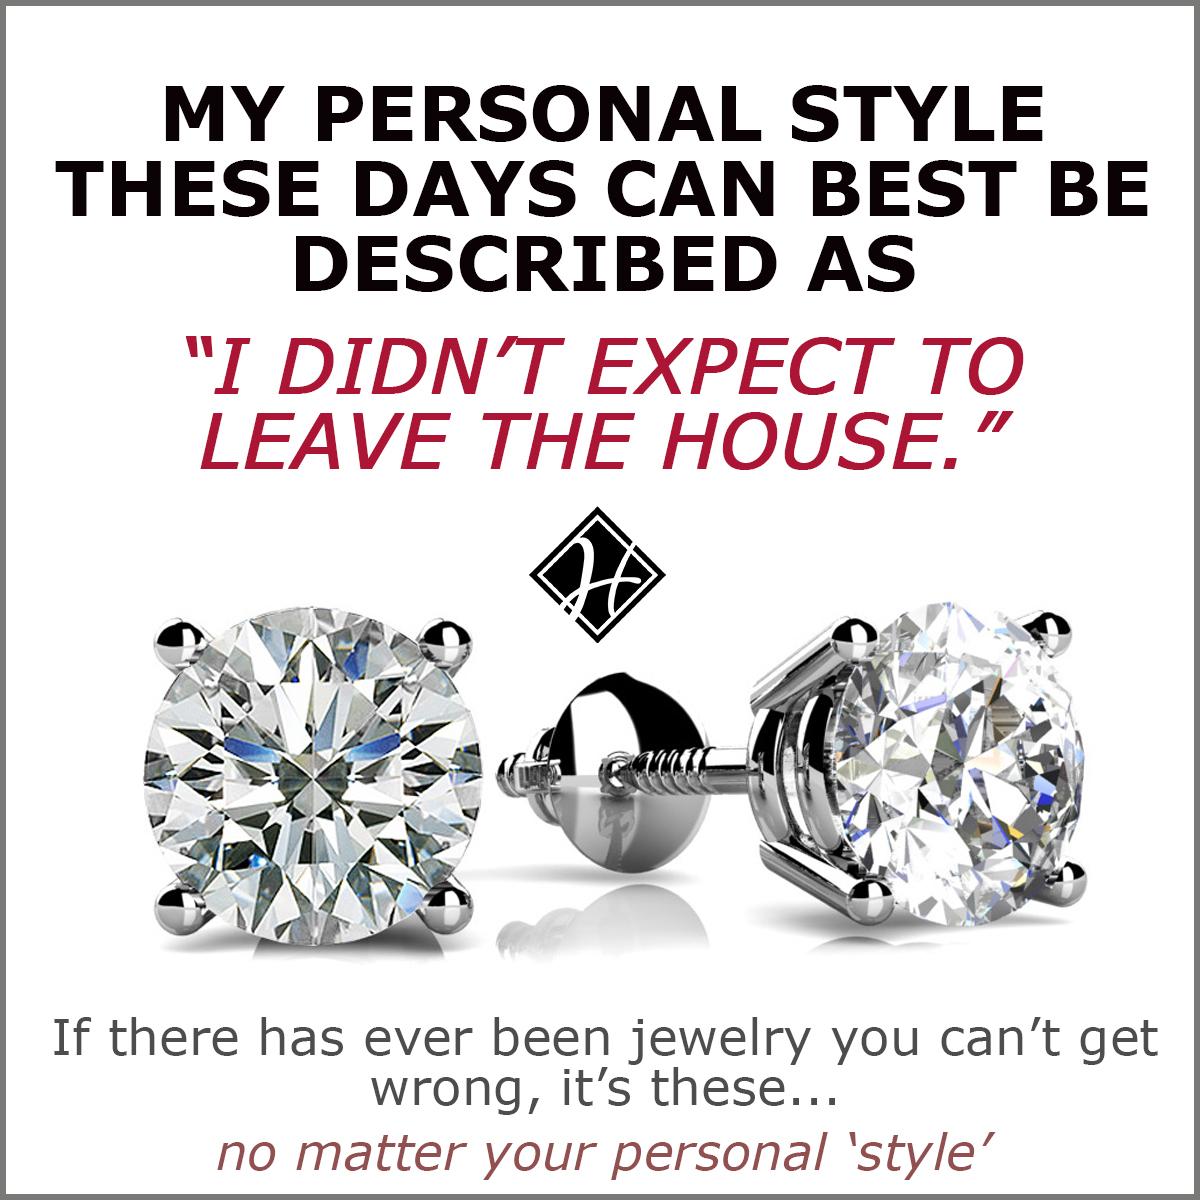 If you need a little pick me up, put on some sparkle, it works every time! #diamonds #sparkle #jewelry #diamondsareagirlsbestfriend #pickmeuppic.twitter.com/AEIZ8tVByp